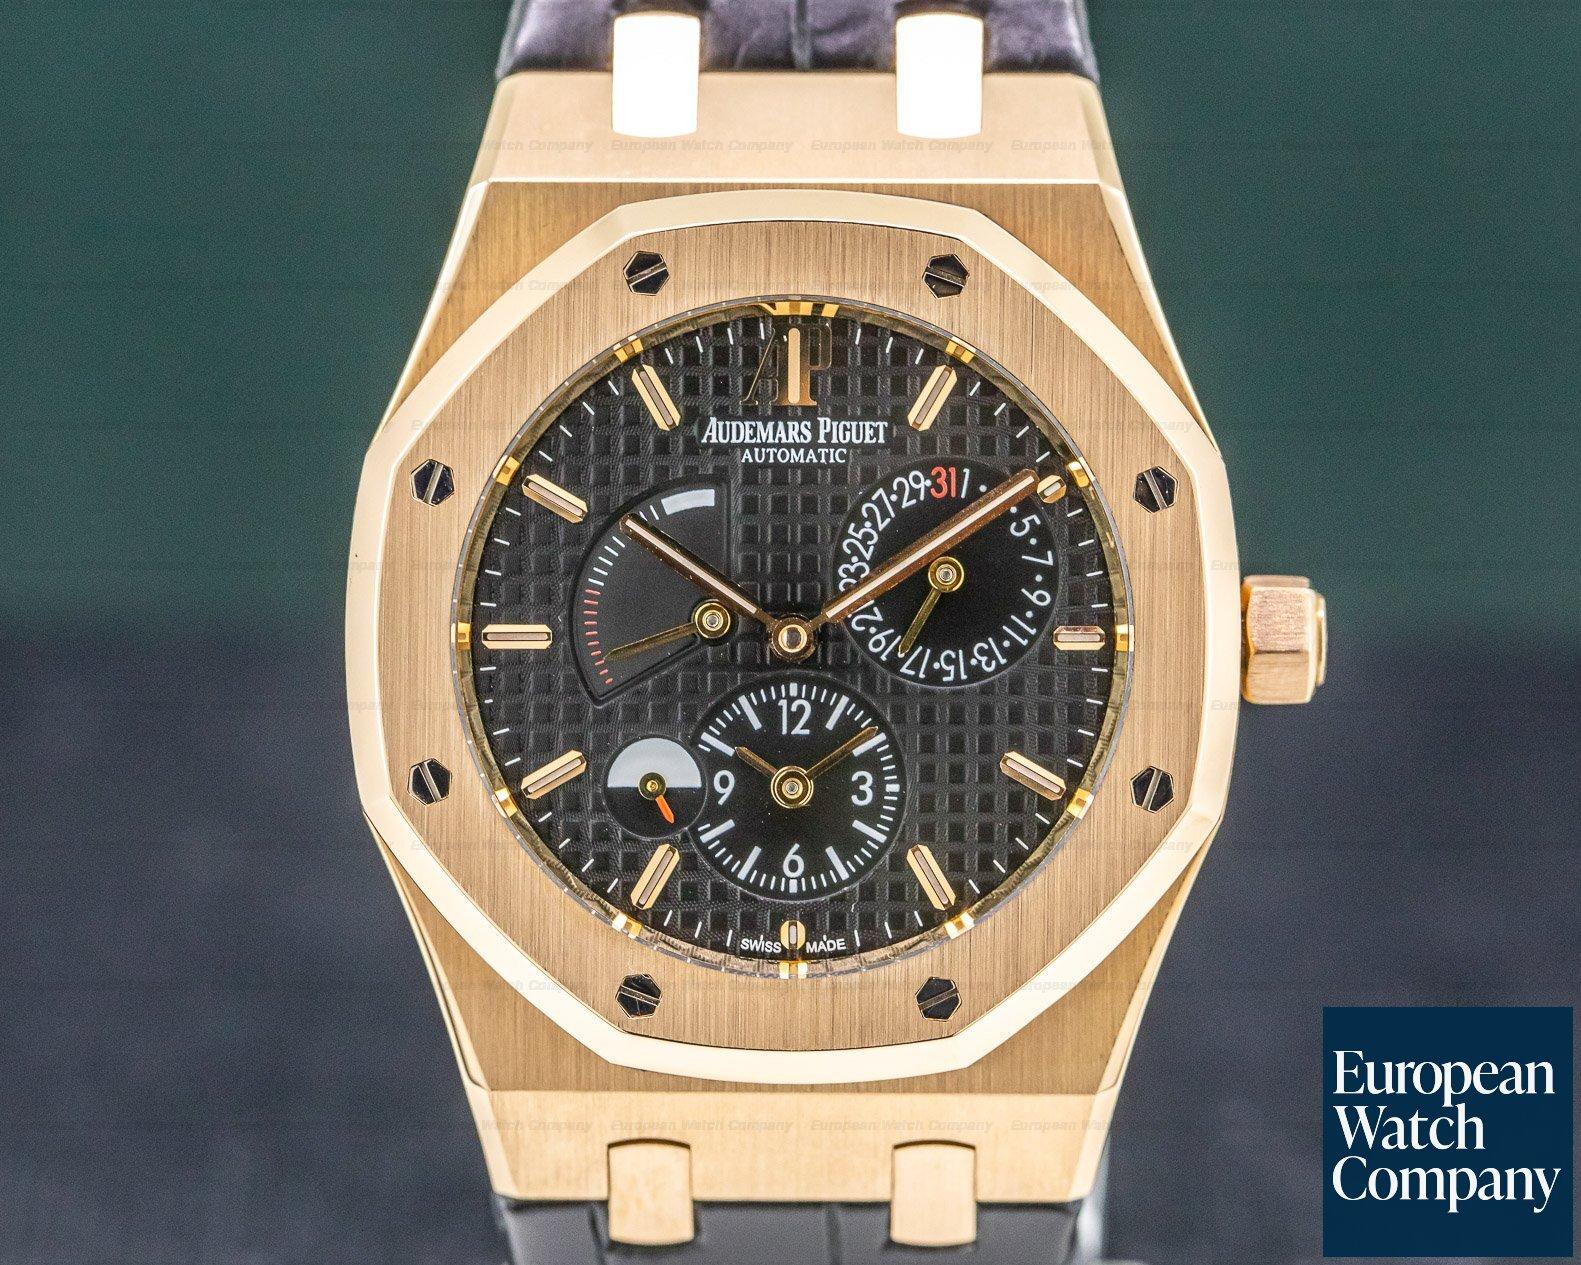 Audemars Piguet 26120OR.OO.D002CR.01 Royal Oak Dual Time 18K Rose Gold / Black Dial